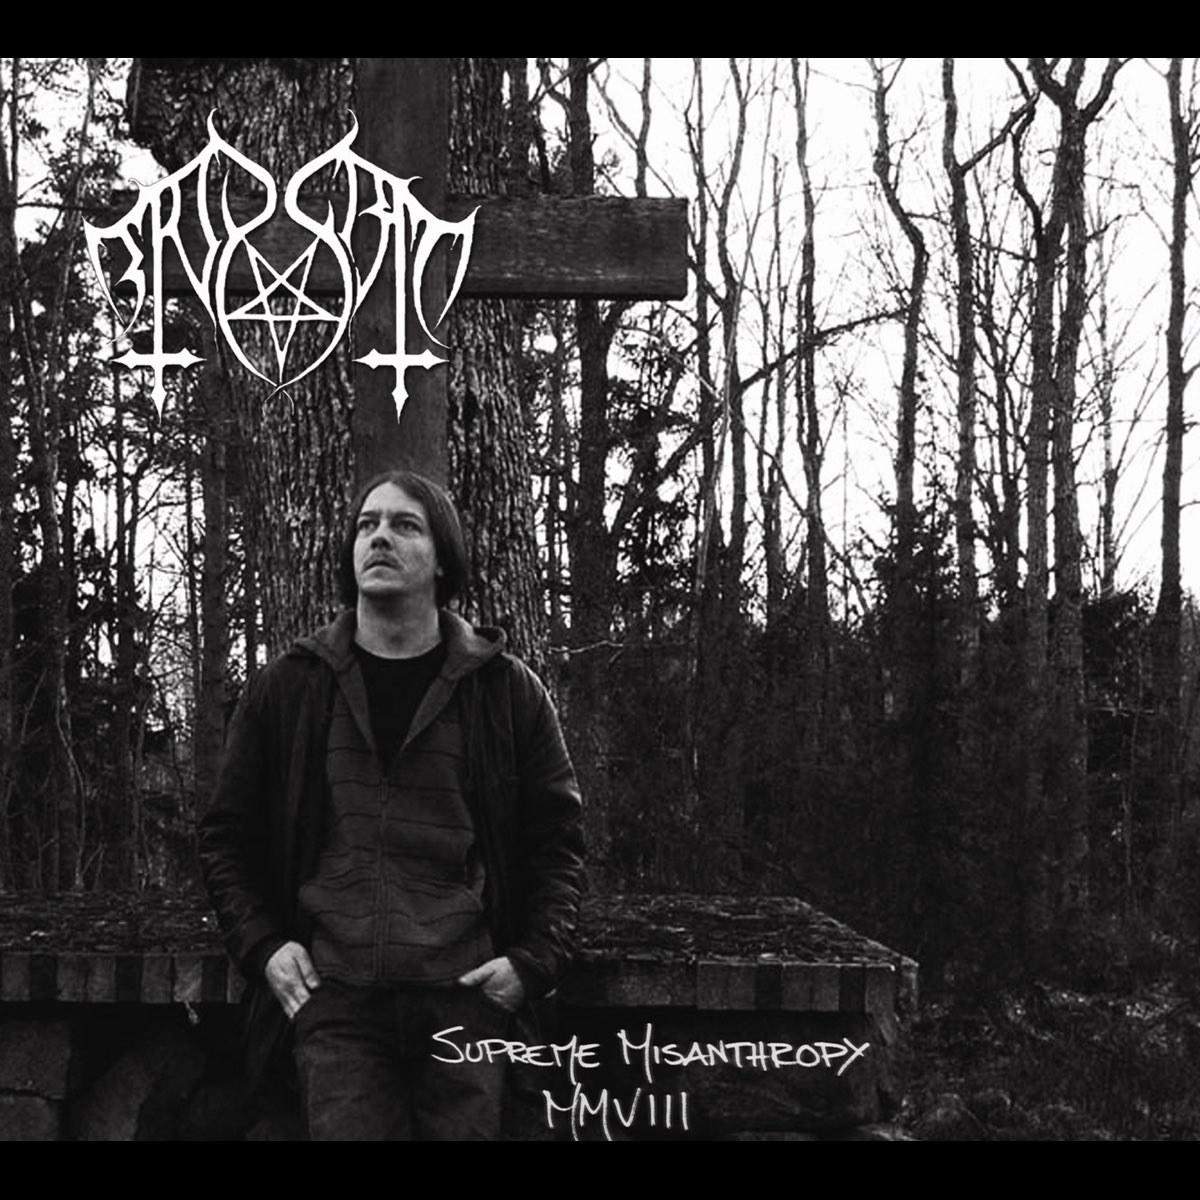 Review for Blodsrit - Supreme Misanthropy MMVIII